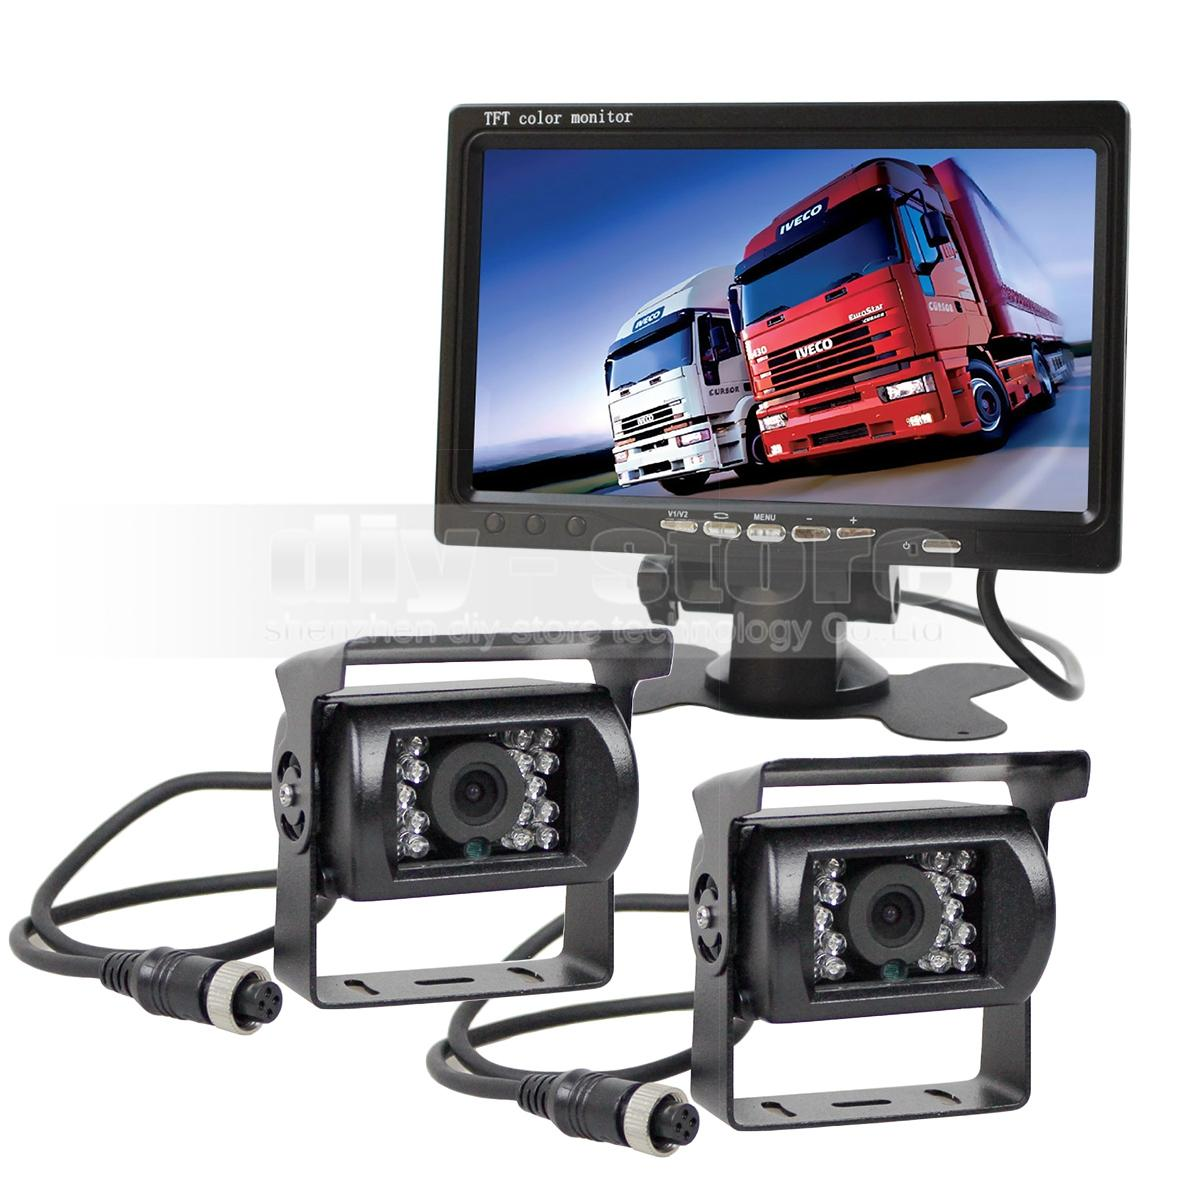 4pin IR Night Vision HD Rear View Camera Kit 7 inch TFT LCD Car Monitor System for Bus Houseboat Truck